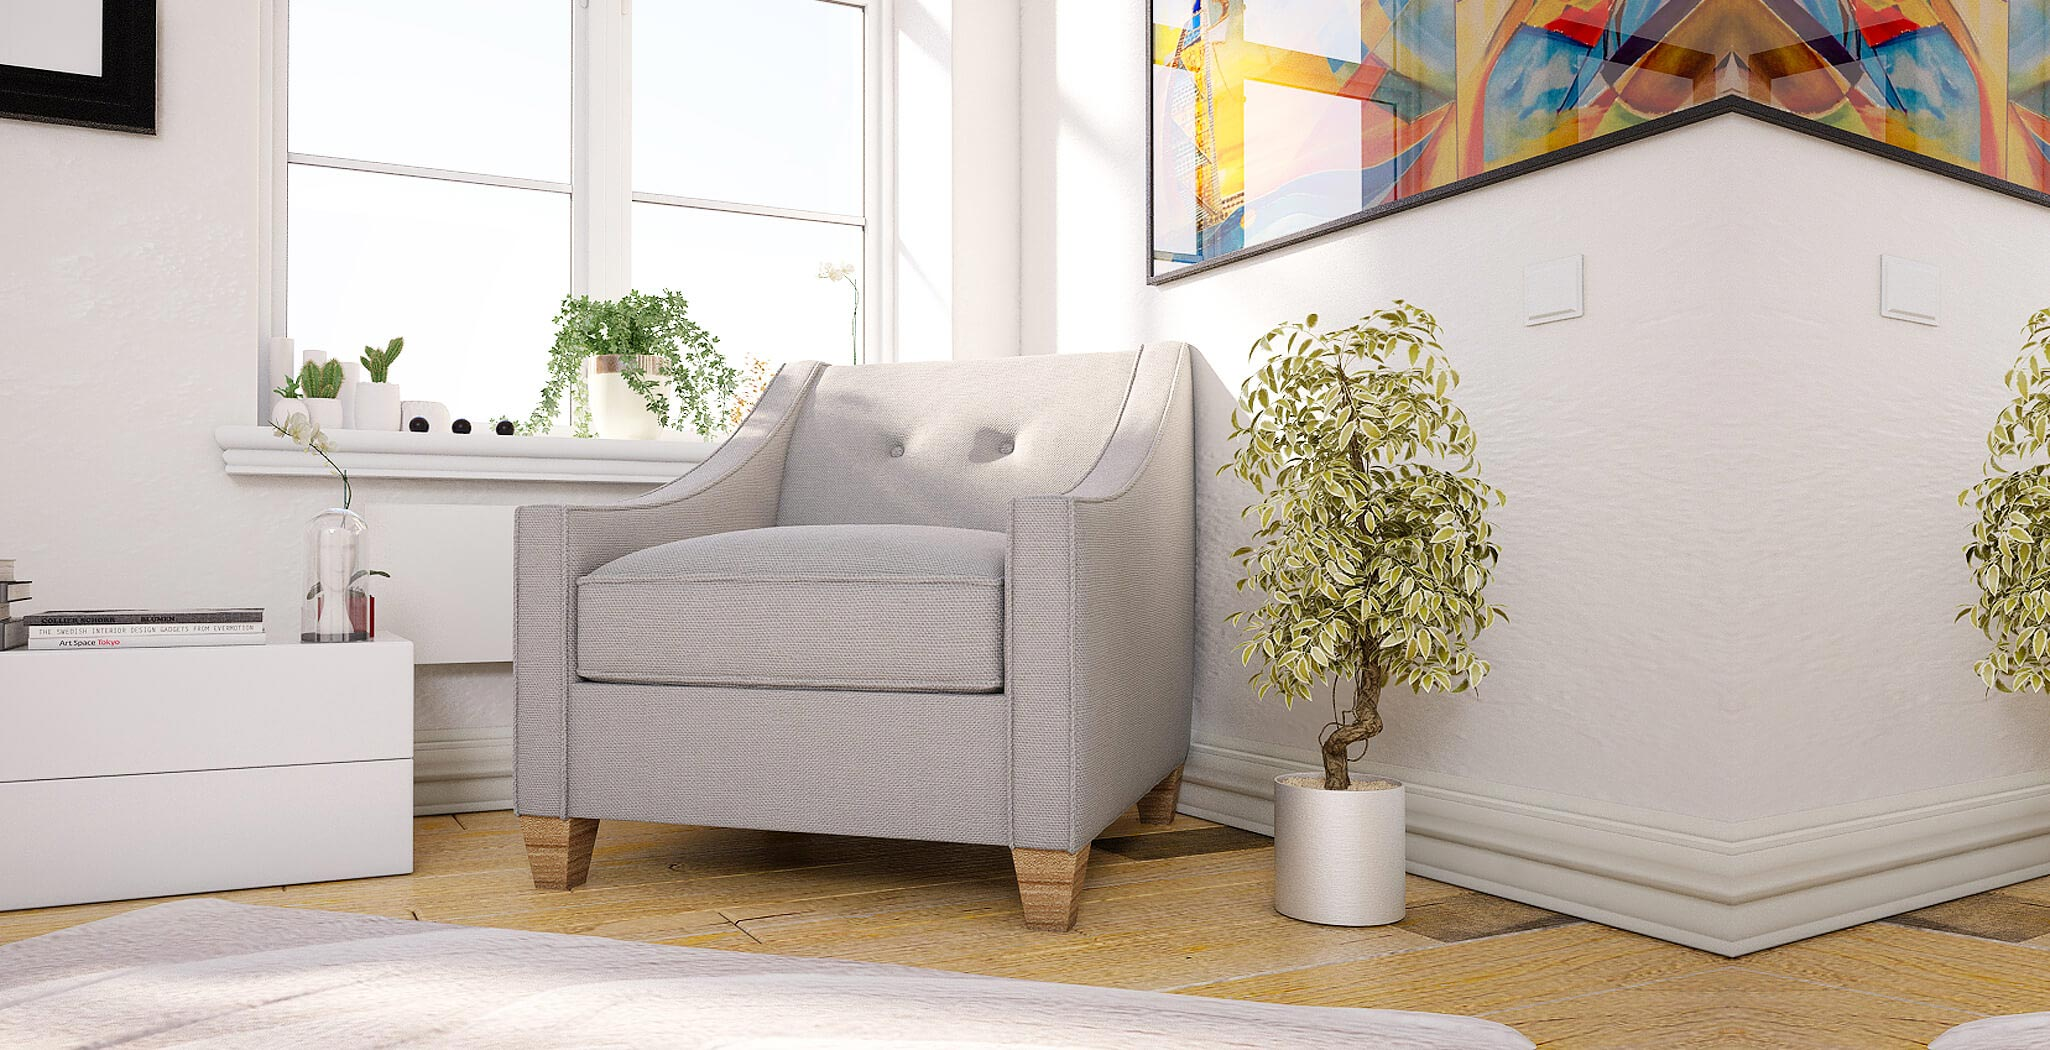 berlin chair furniture gallery 2